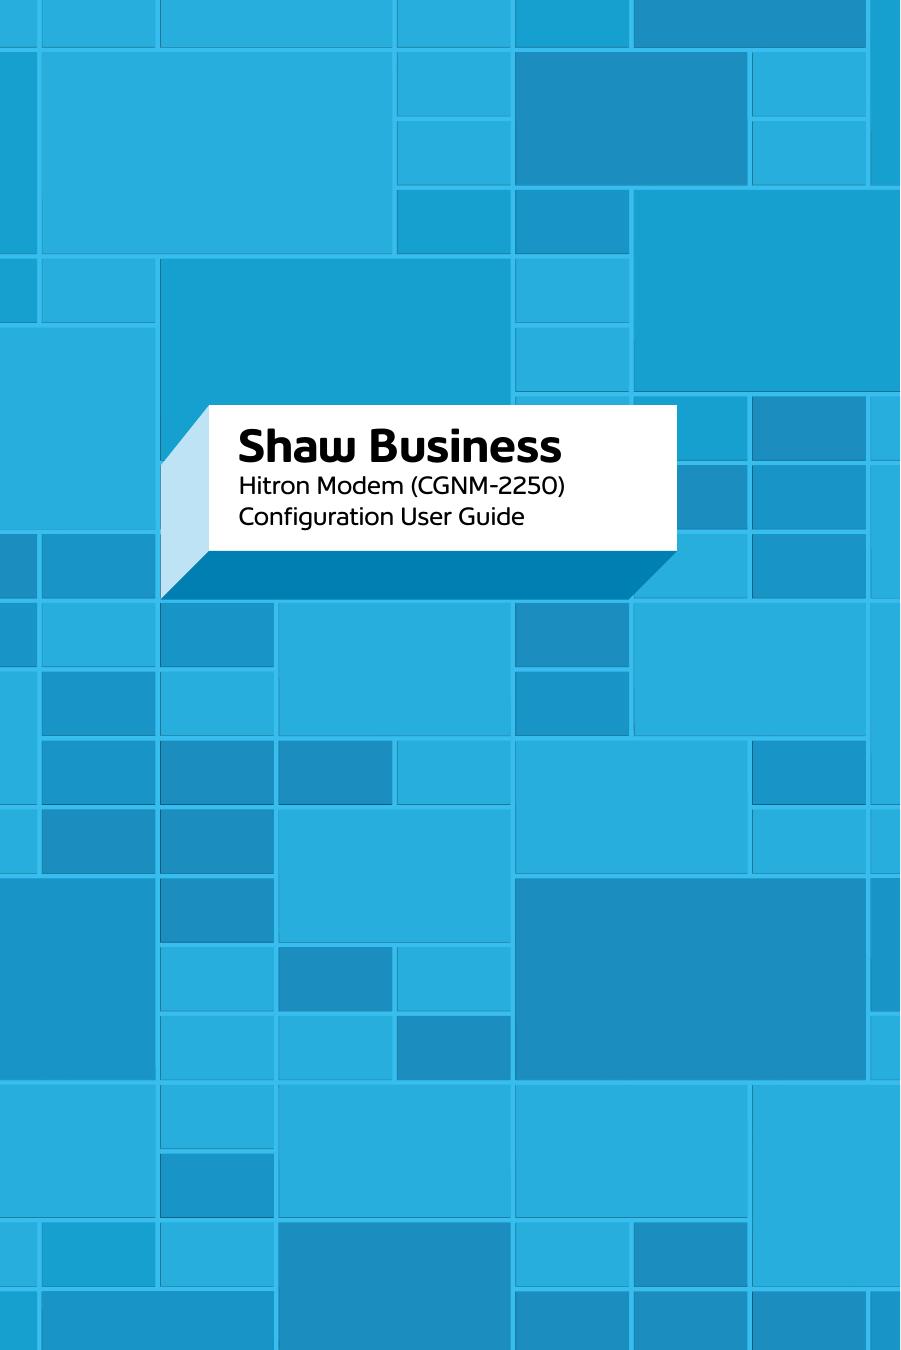 Shaw Business Hosted PBX User Guide | manualzz com